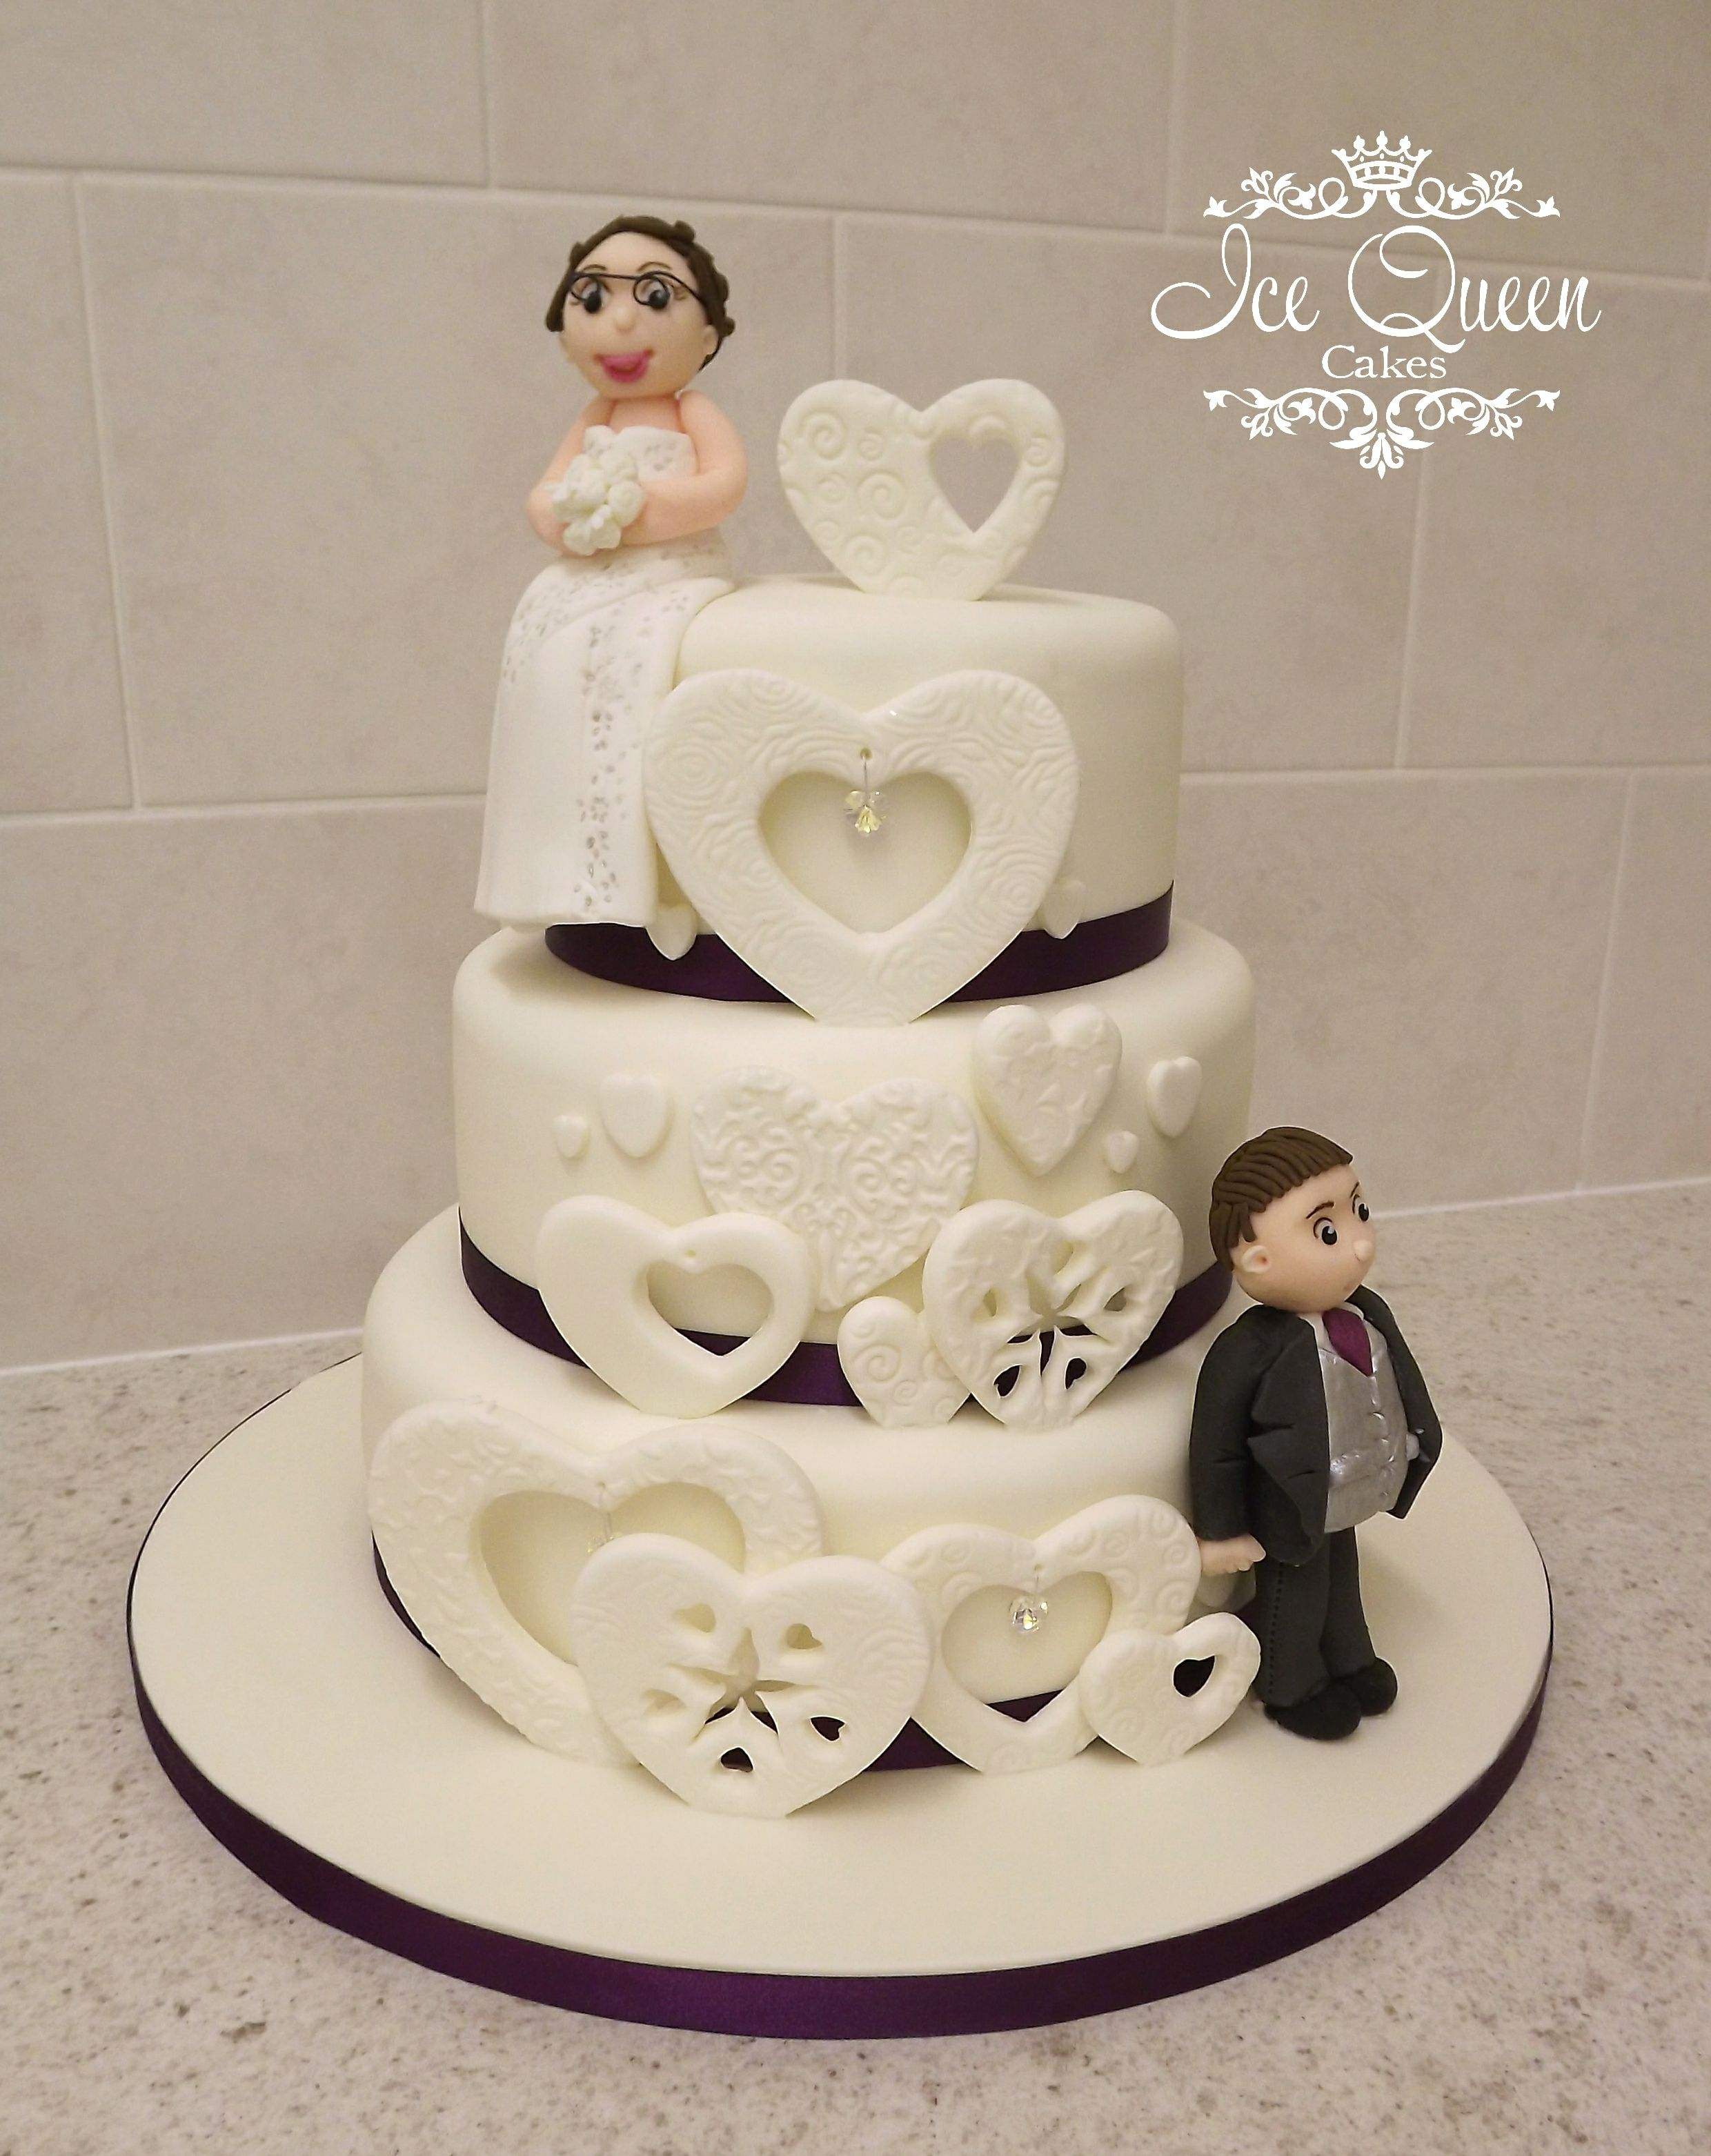 3 Tier Wedding Cake With Mr Mrs Standing Between Hearts Ice - Wedding Cakes Wigan